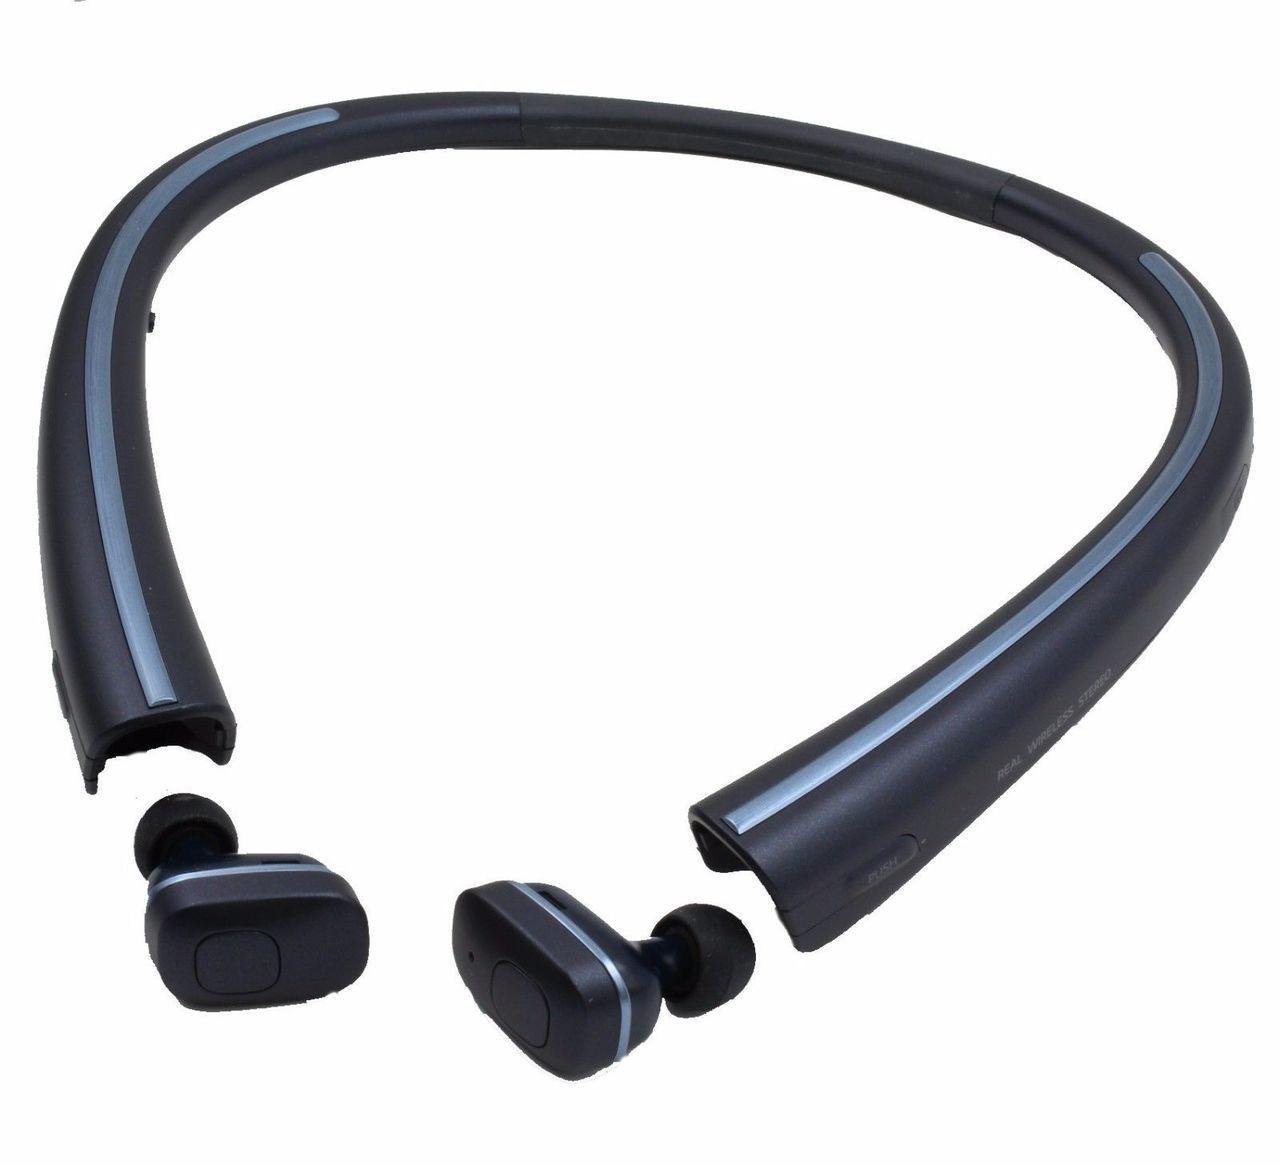 Lg Hbs F110 Tone Free Bluetooth Wireless Earbuds Black Esurebuy Com